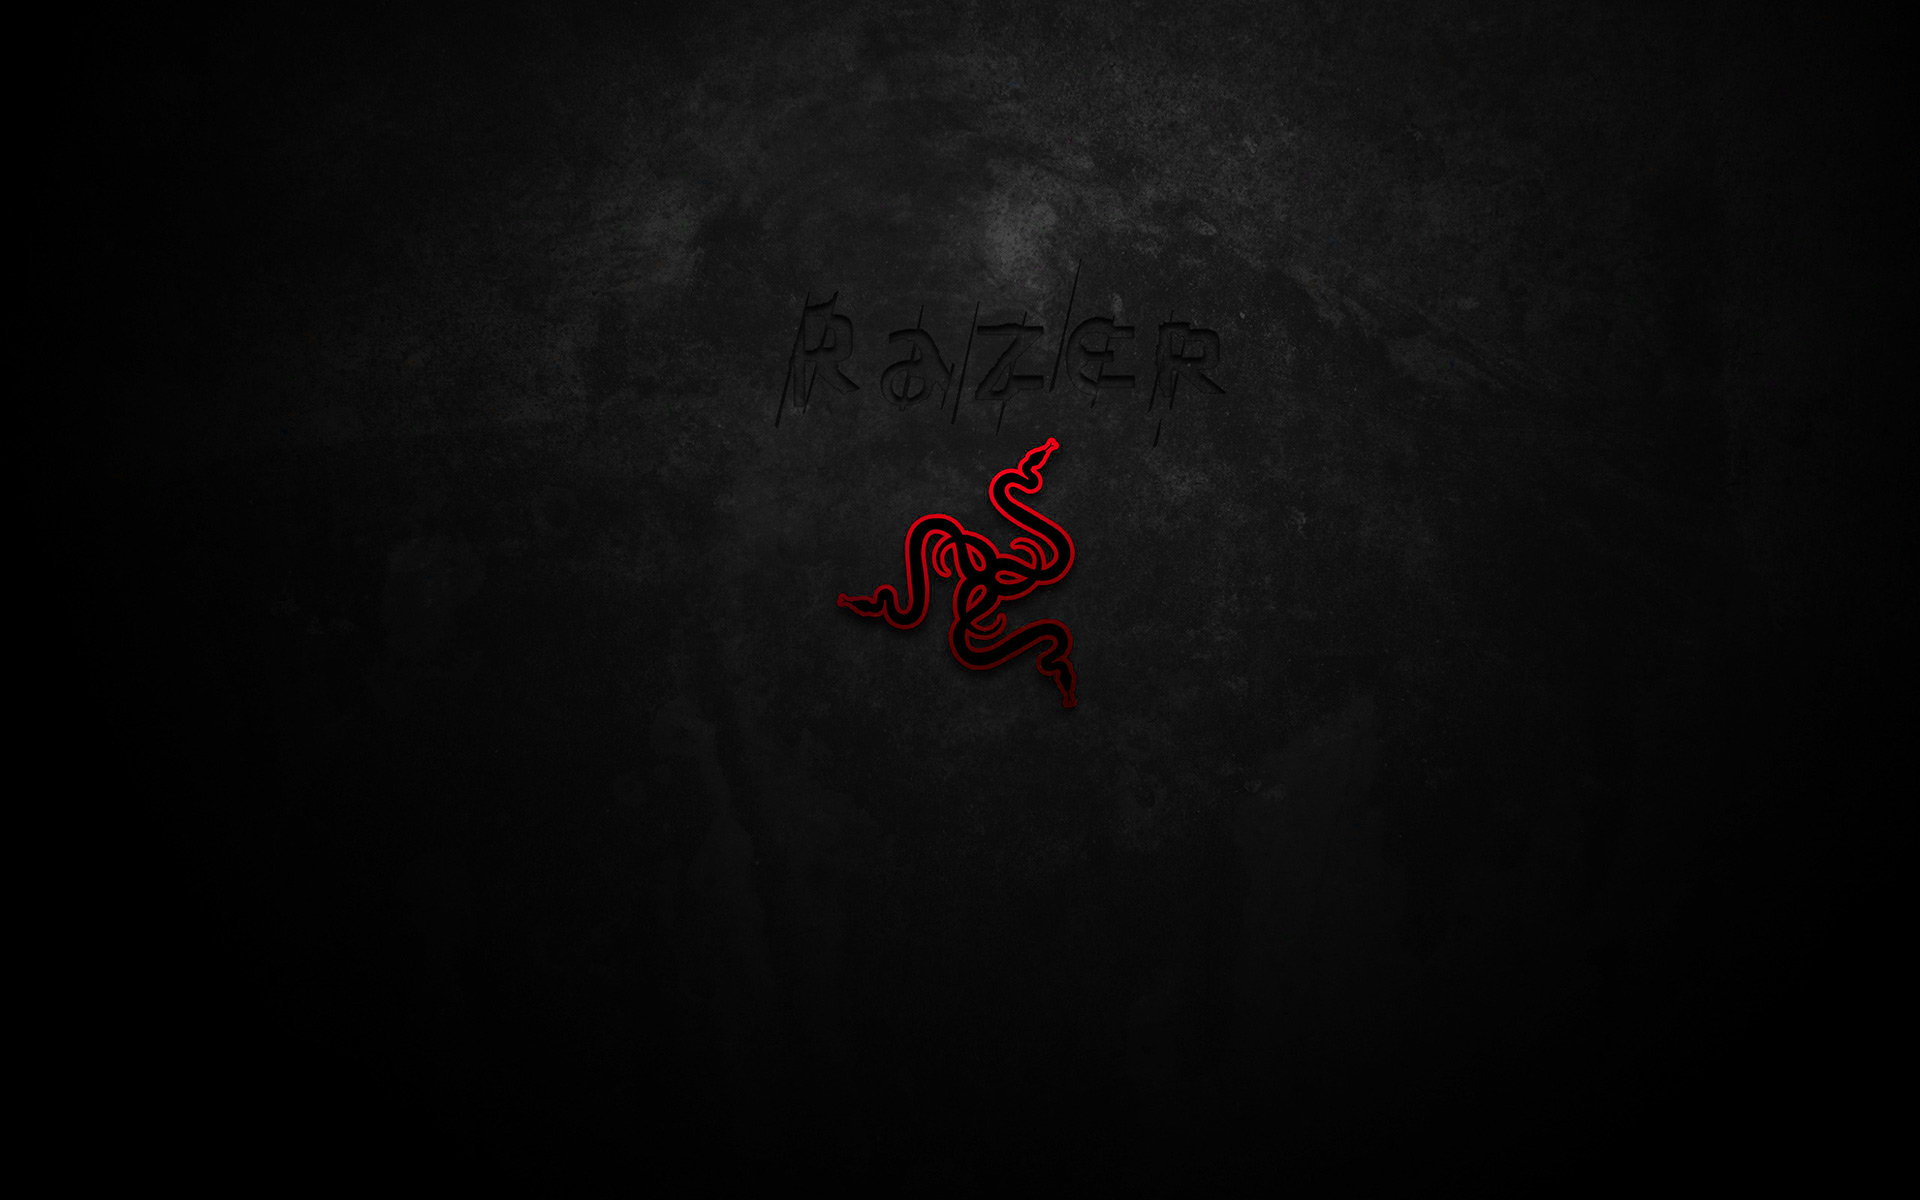 Download wallpaper hd 1080p black and red   The Razer Chroma Wallpaper 1920x1200